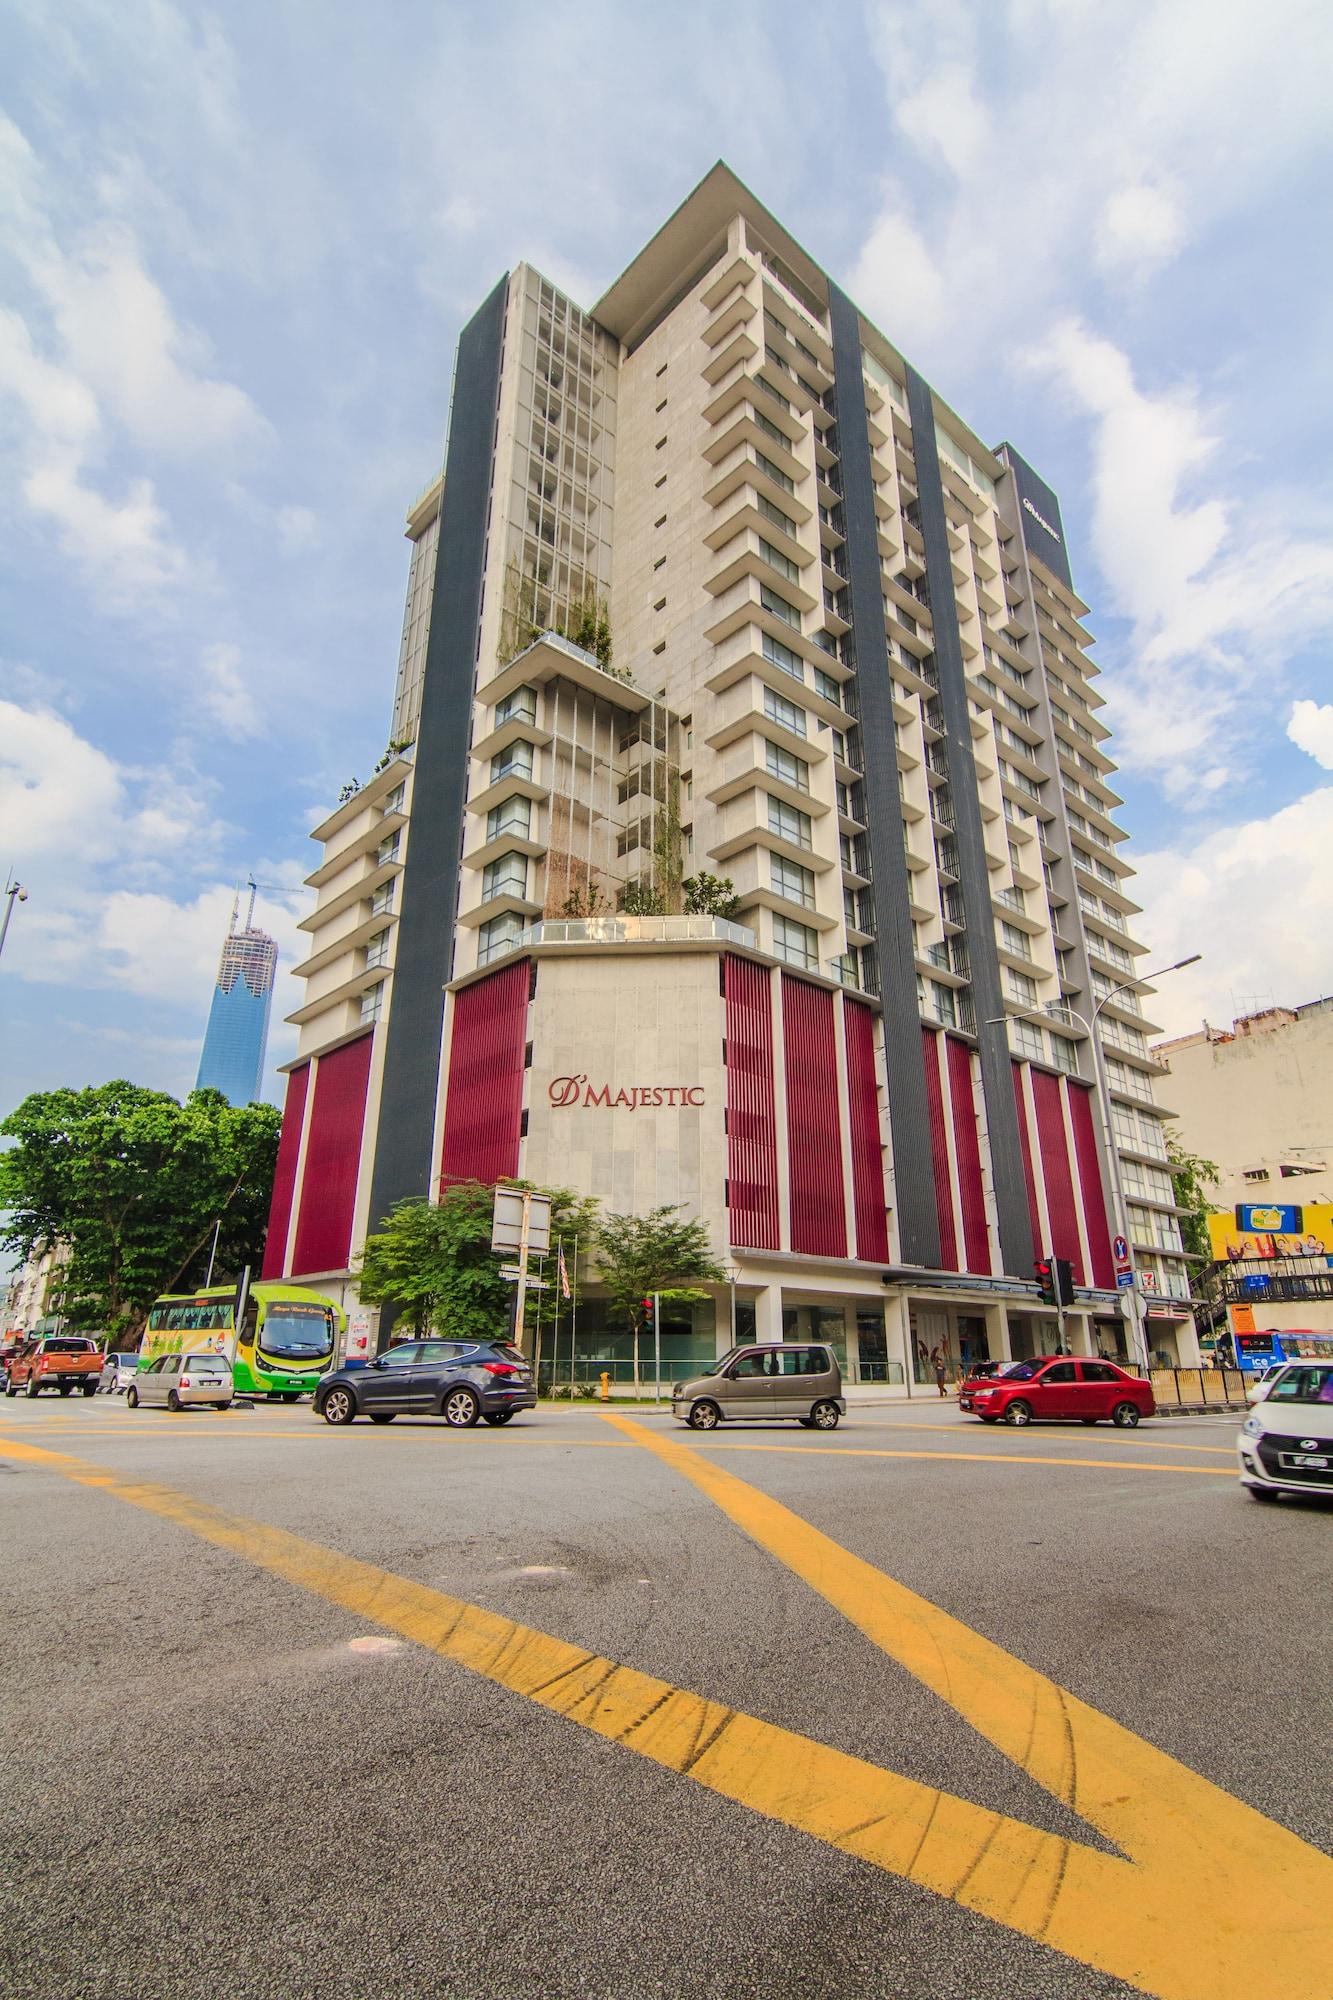 D'majestic Place by Homes Asian 4, Kuala Lumpur